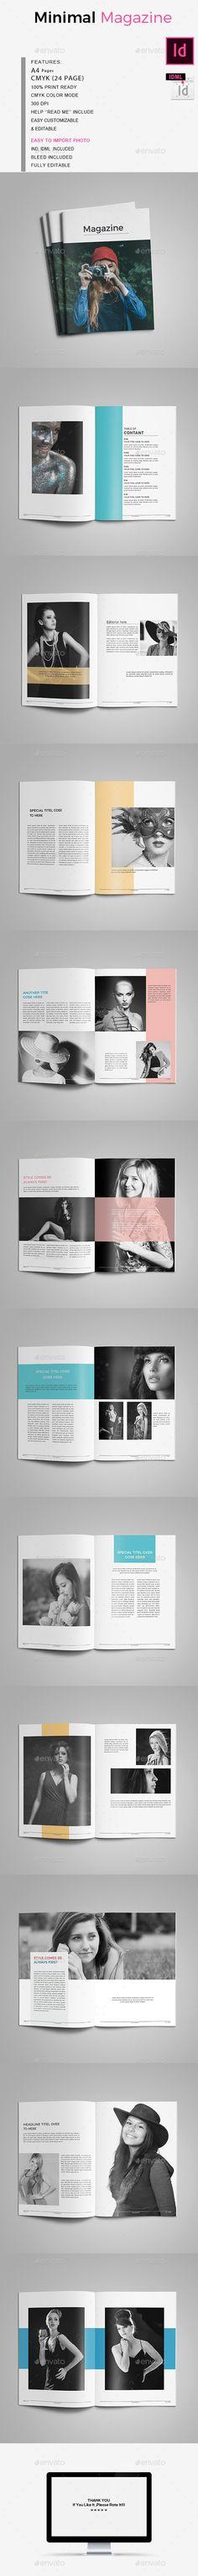 Minimal Magazine Tamplate - Magazines Print Templates